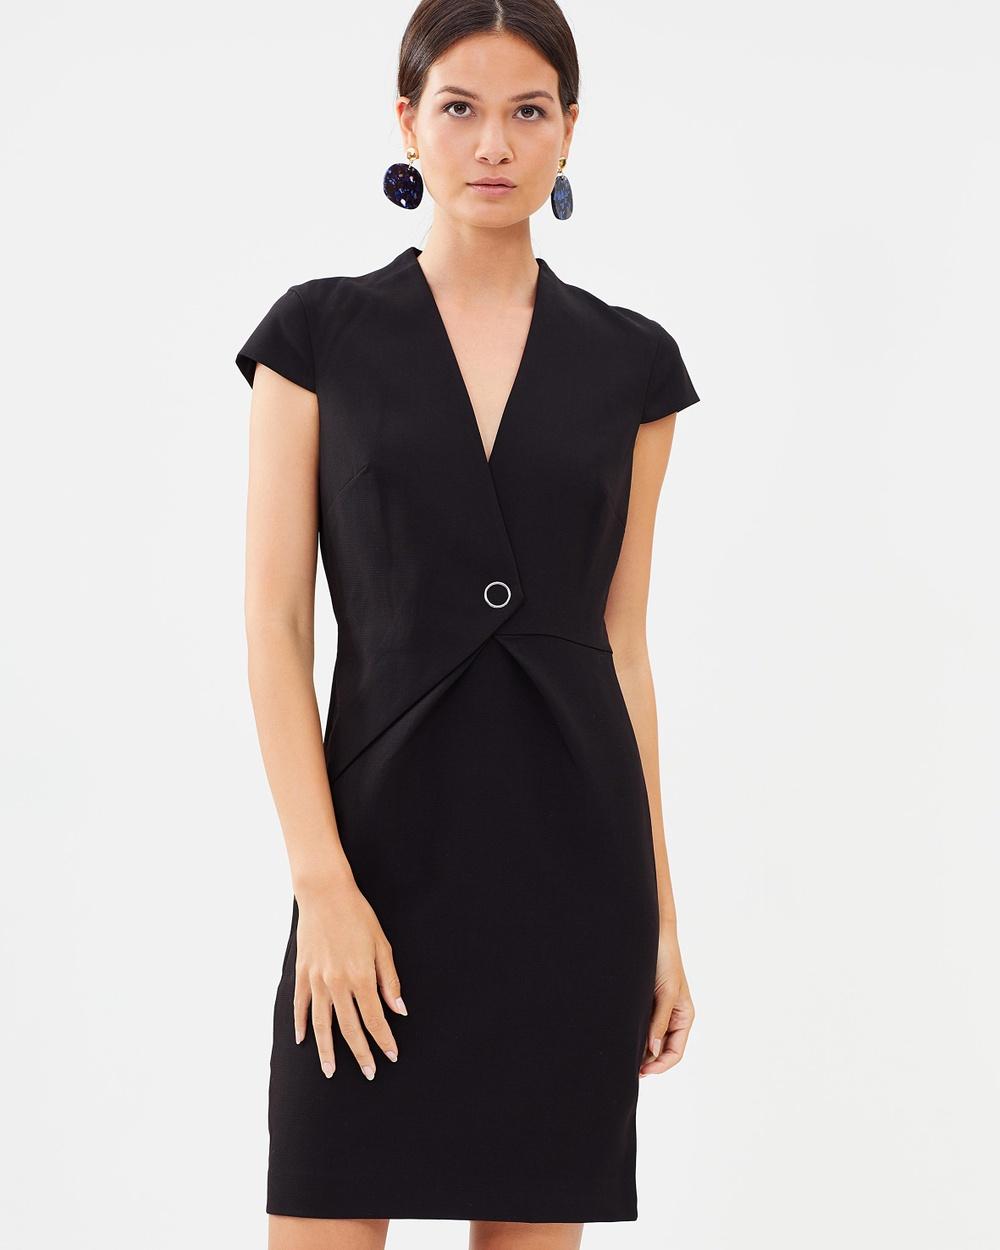 M.N.G Dusty Dress Dresses Black Dusty Dress